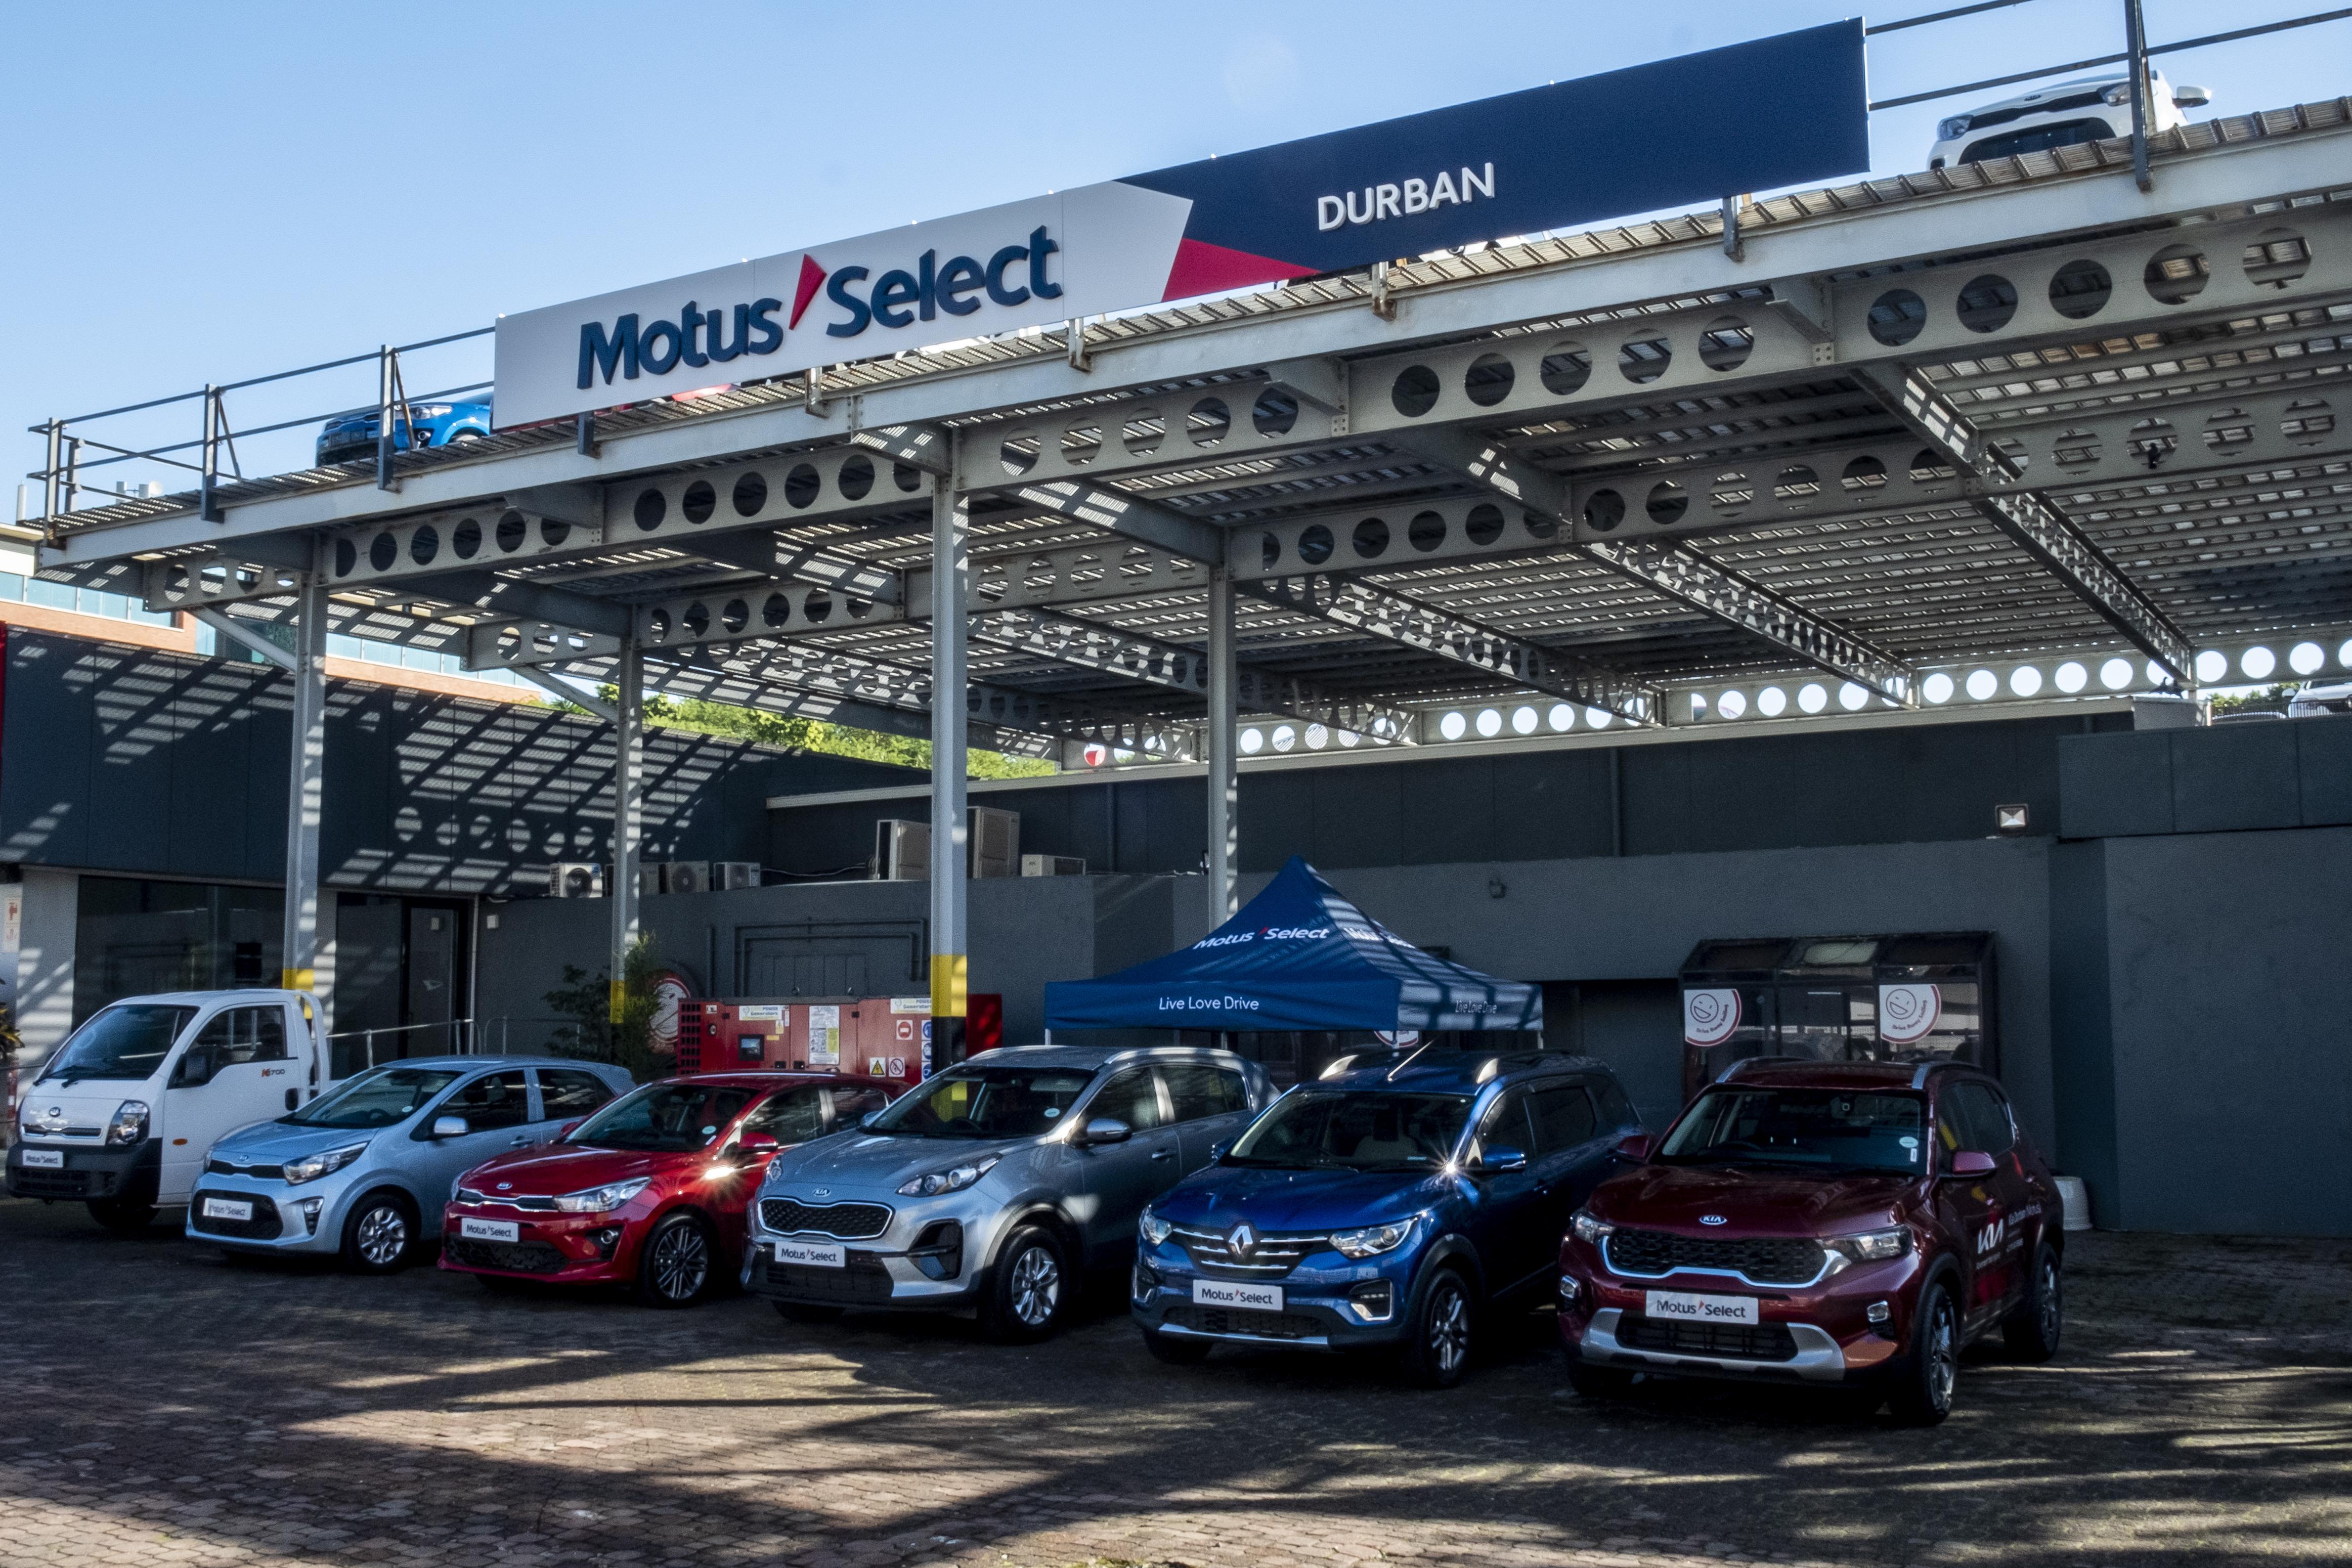 Motus Select Durban